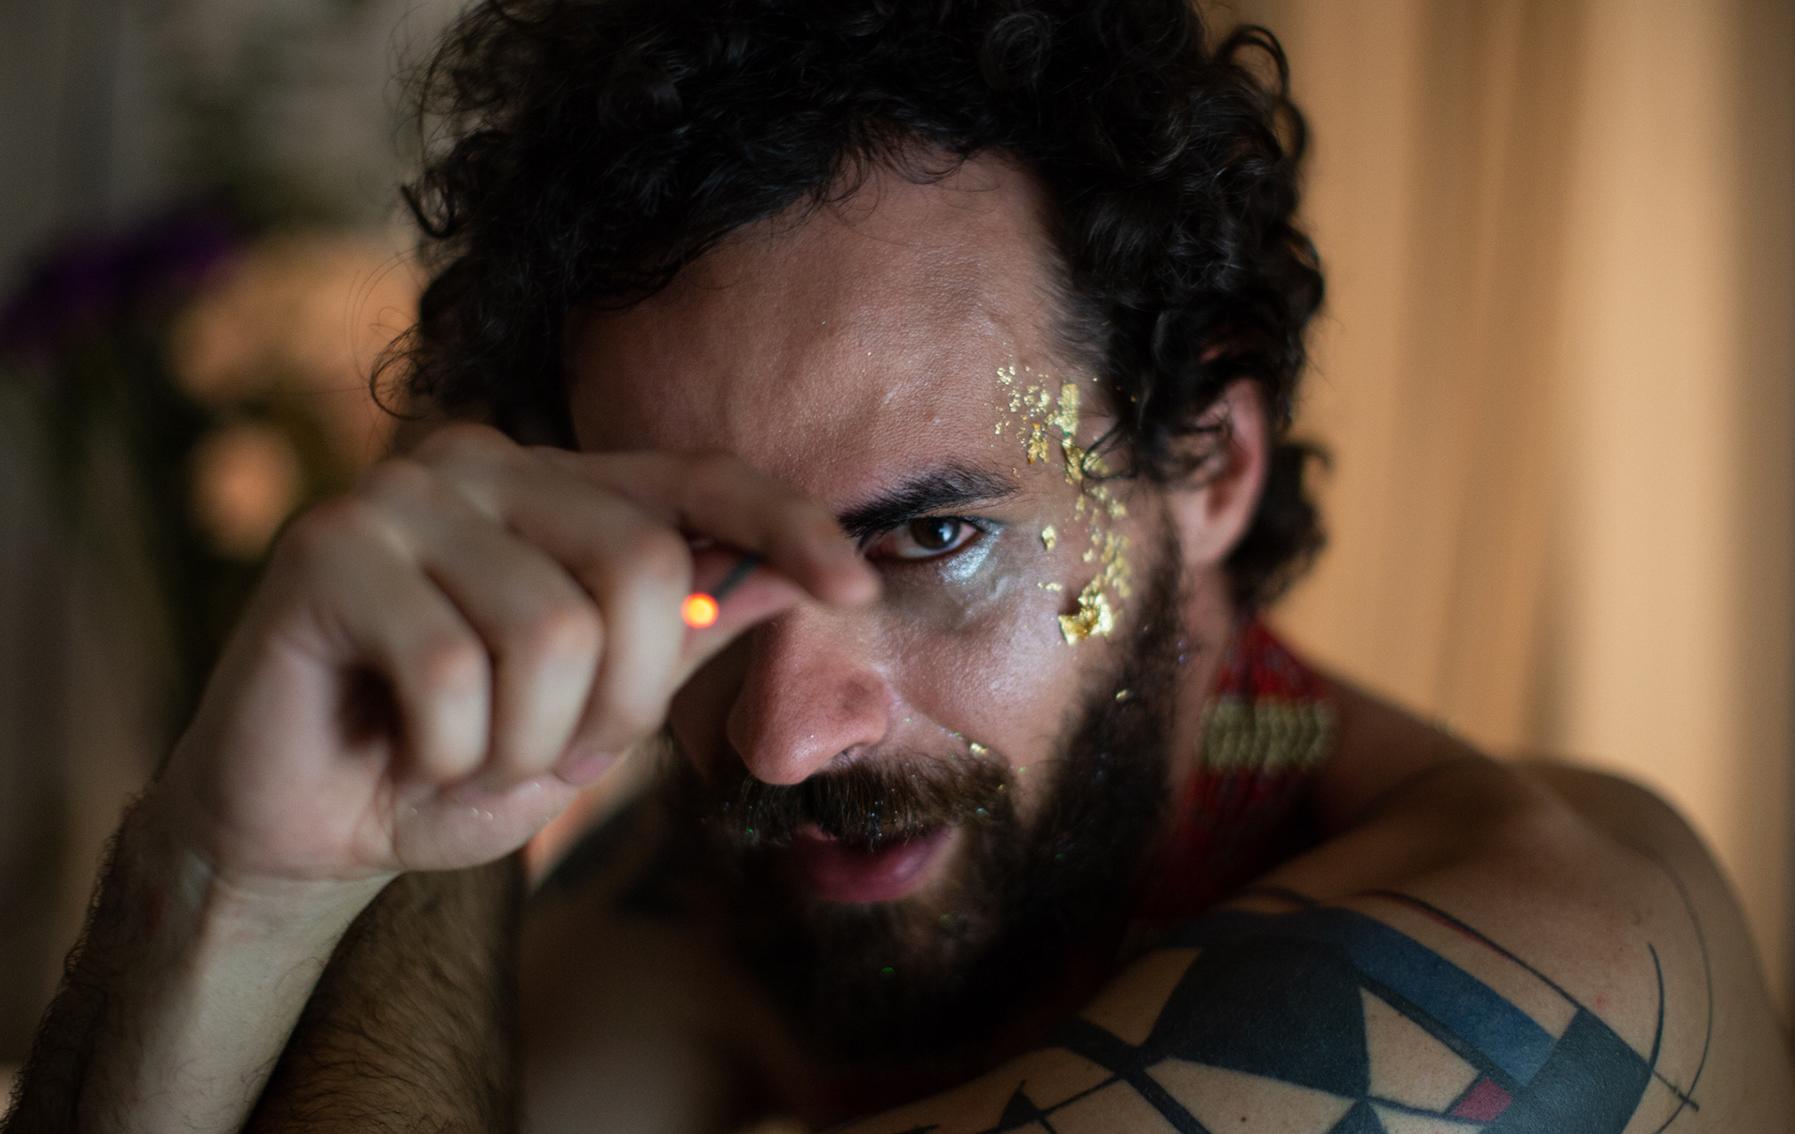 https://www.filmfest-muenchen.de/Pictures/Filme/107/6208/calidris-online1.jpg